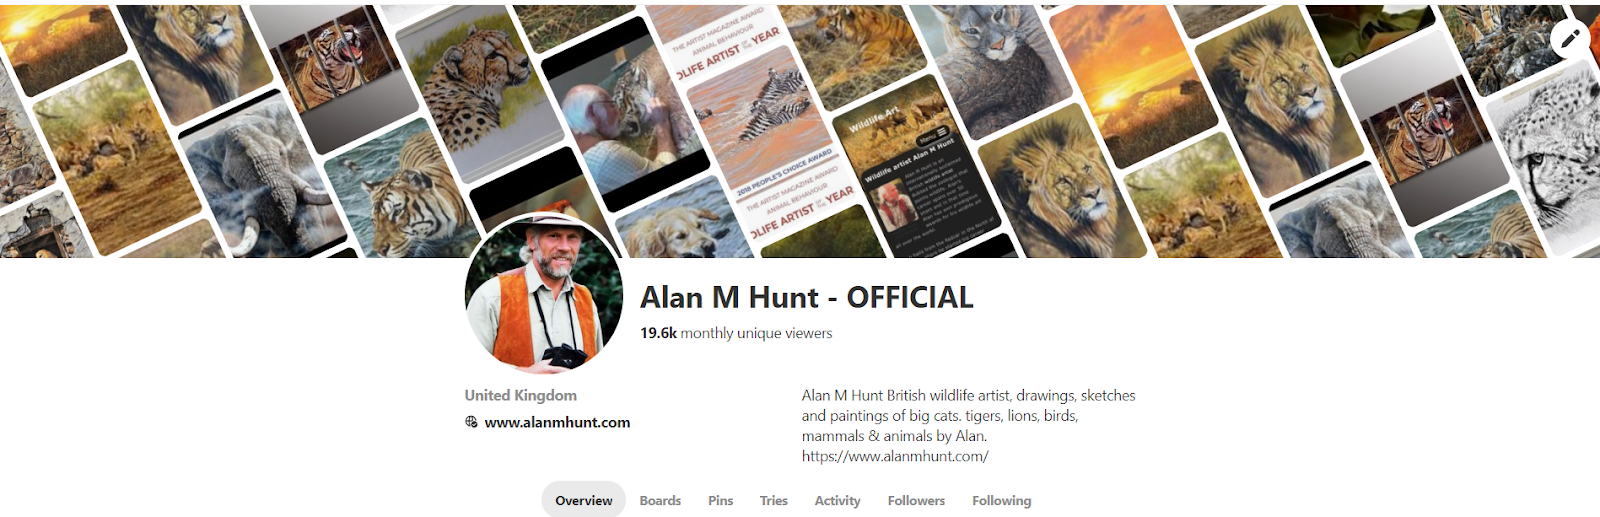 Alan m hunt trio of limited edition wildlife prints: parade.